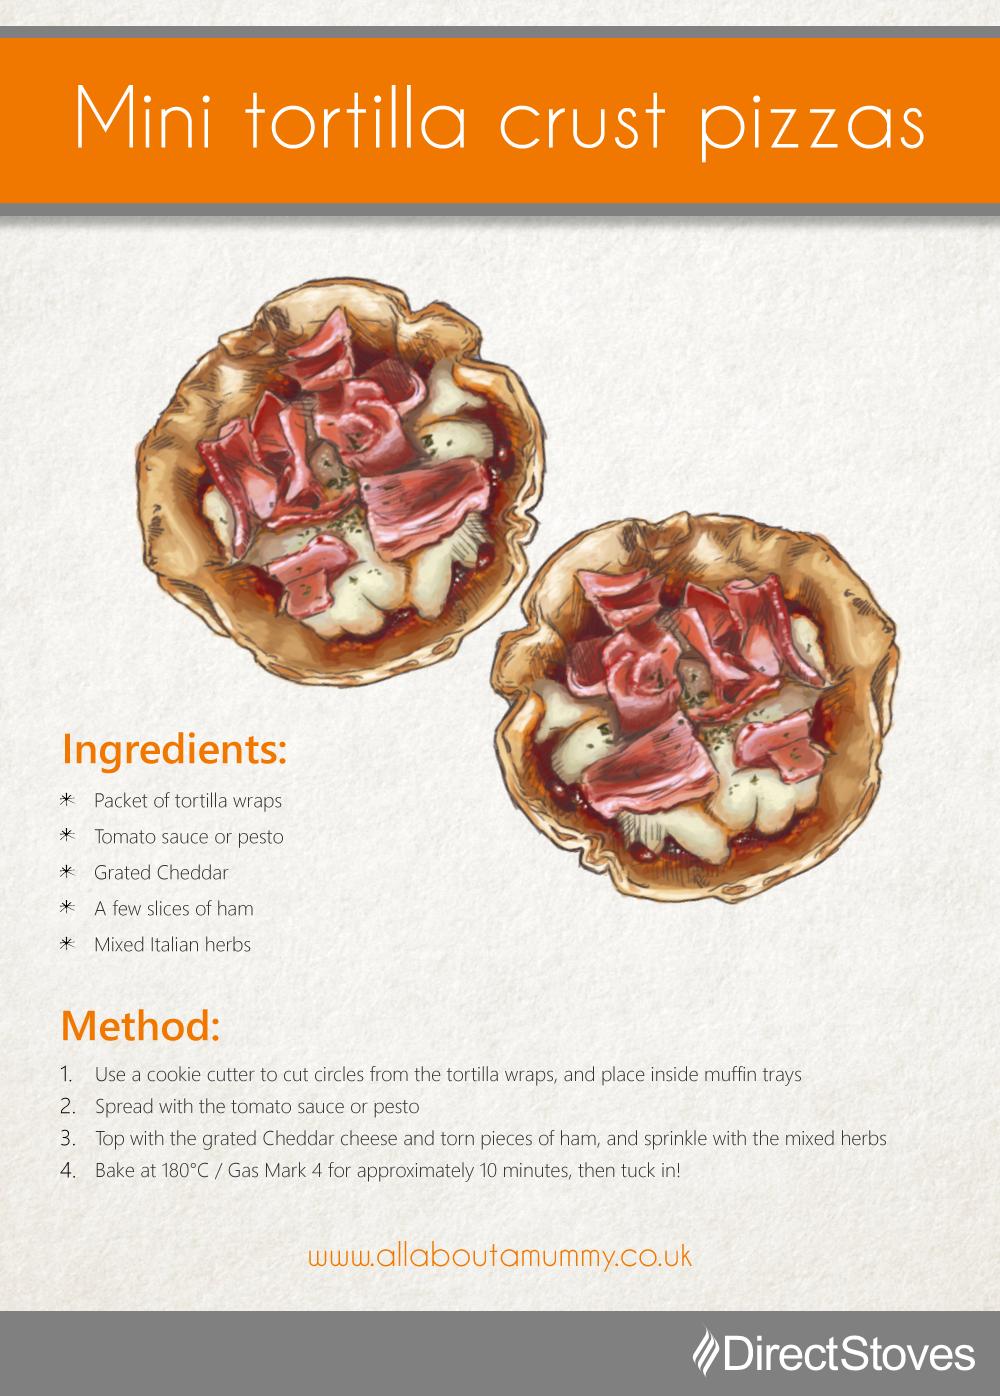 Pizza recipe card: Mini tortilla crust pizzas